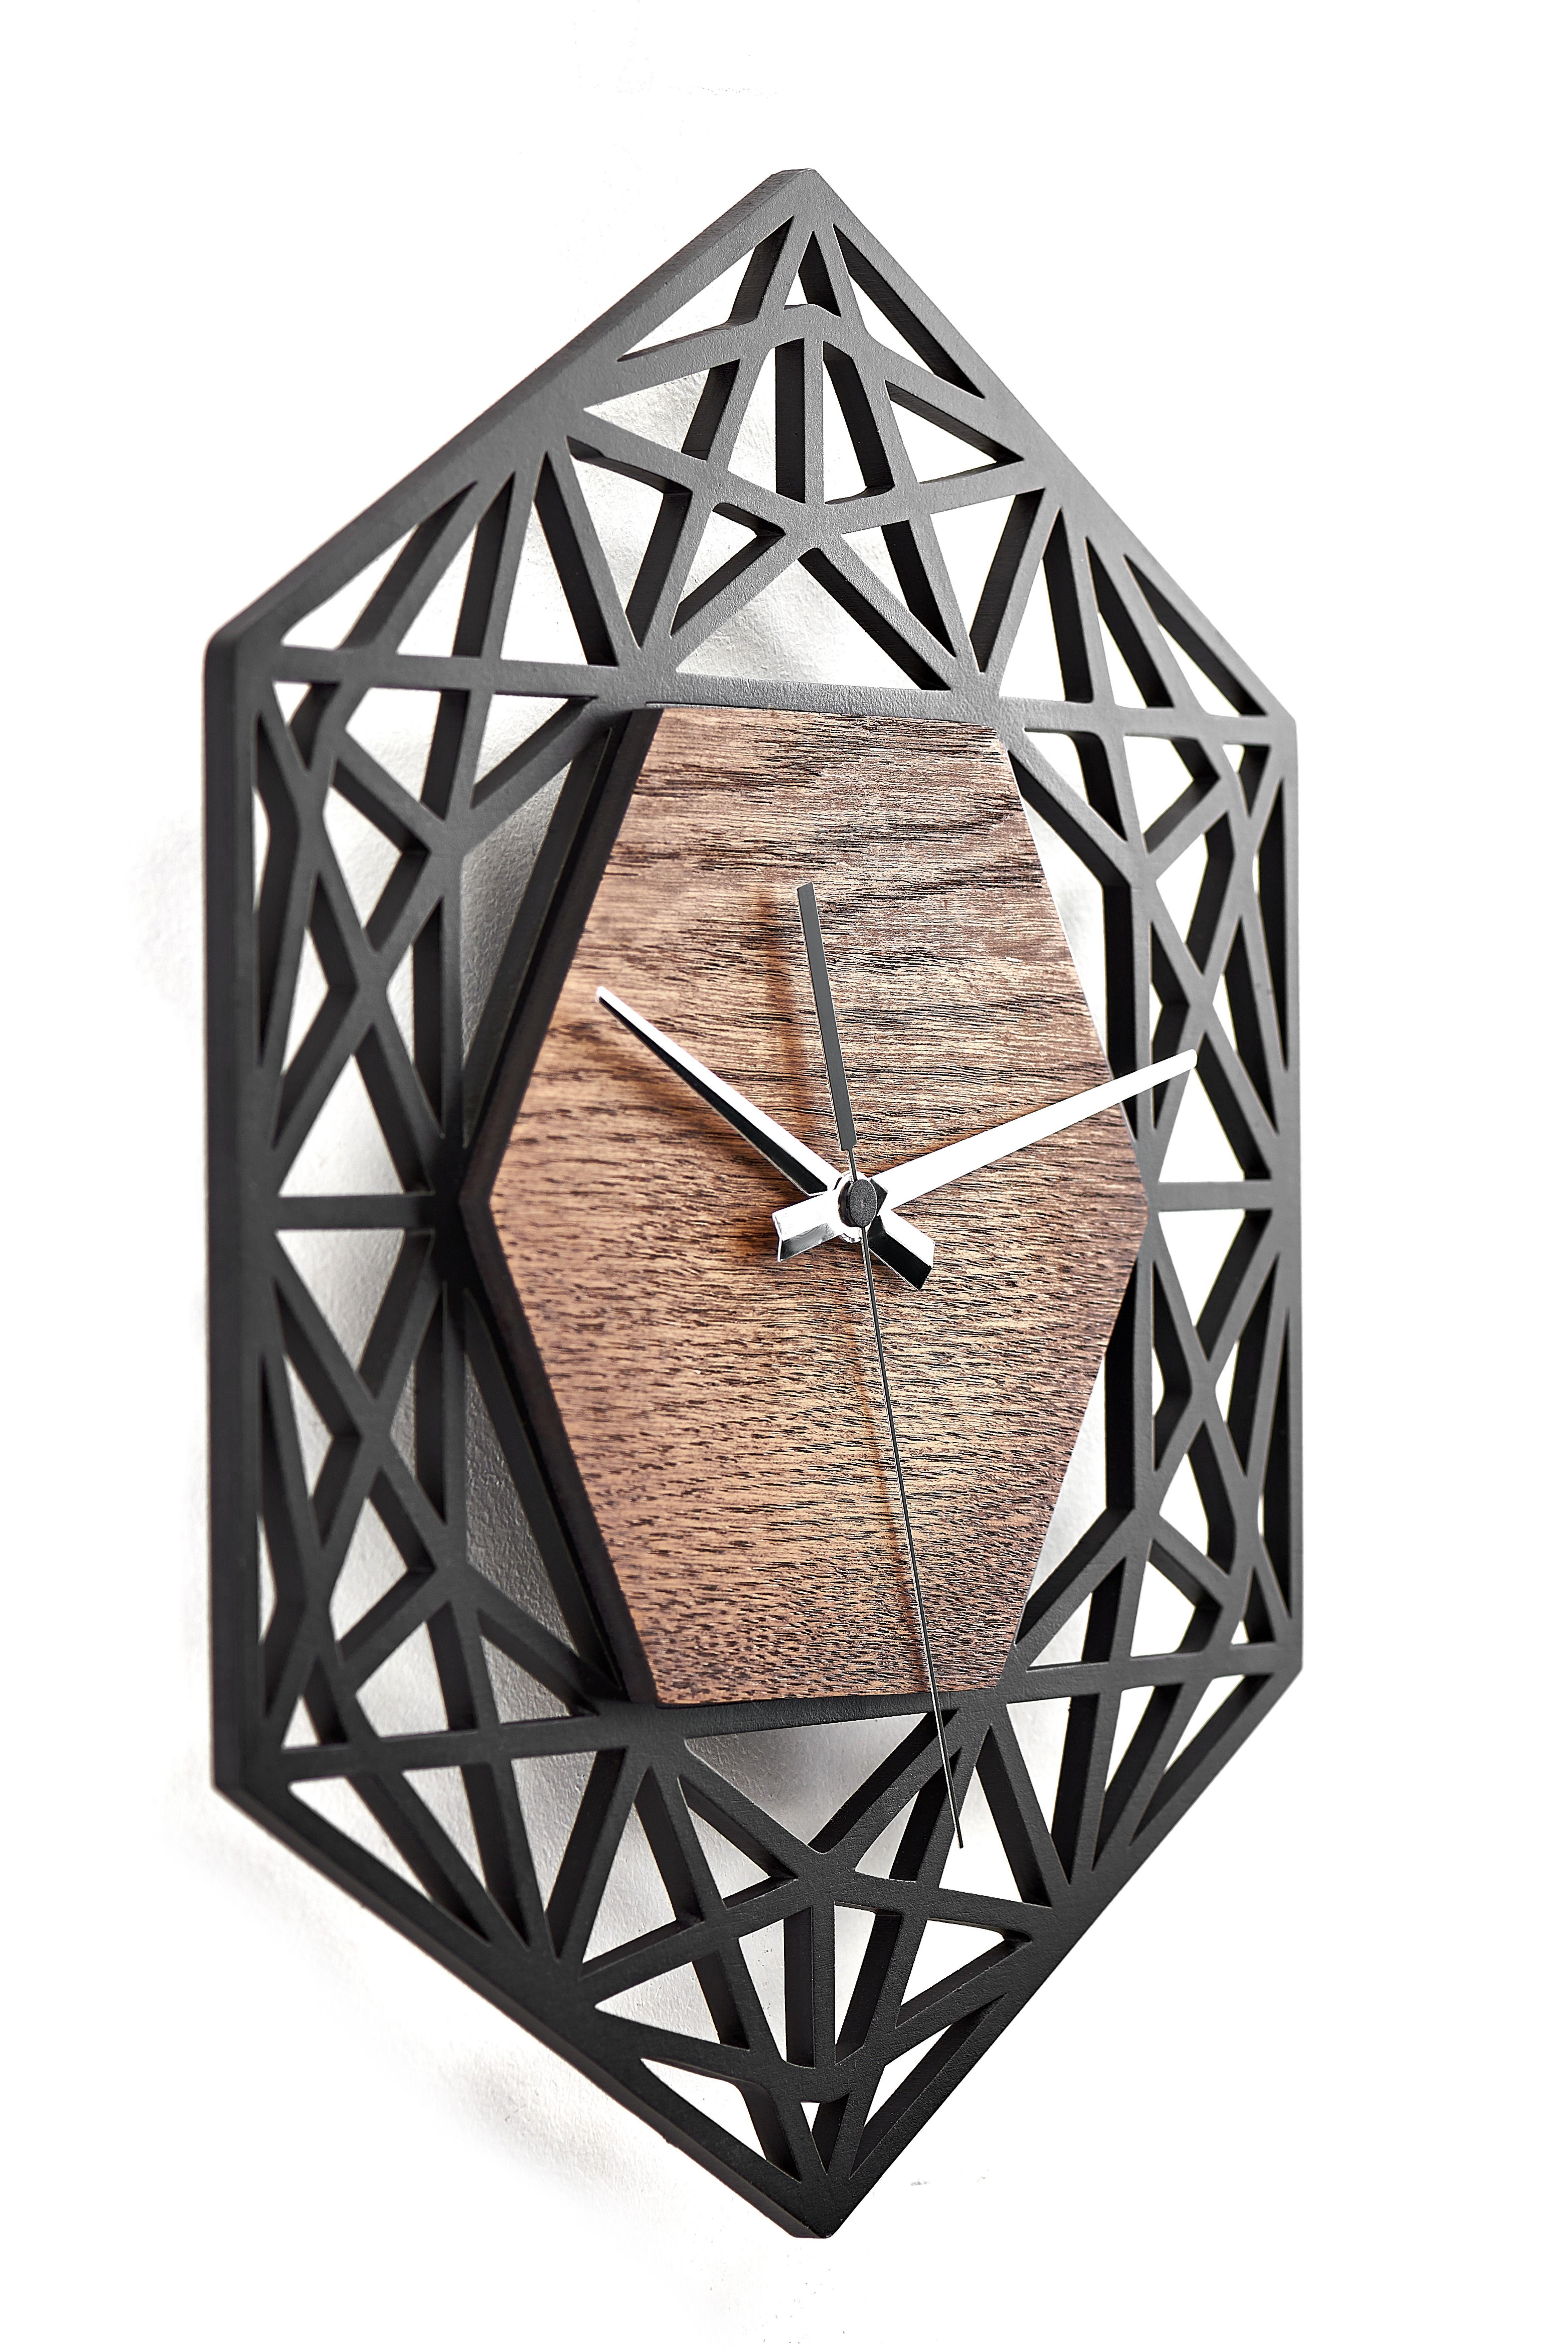 23 Wall Clock Design Ideas Wall Clock Design Clock Design Wall Clock